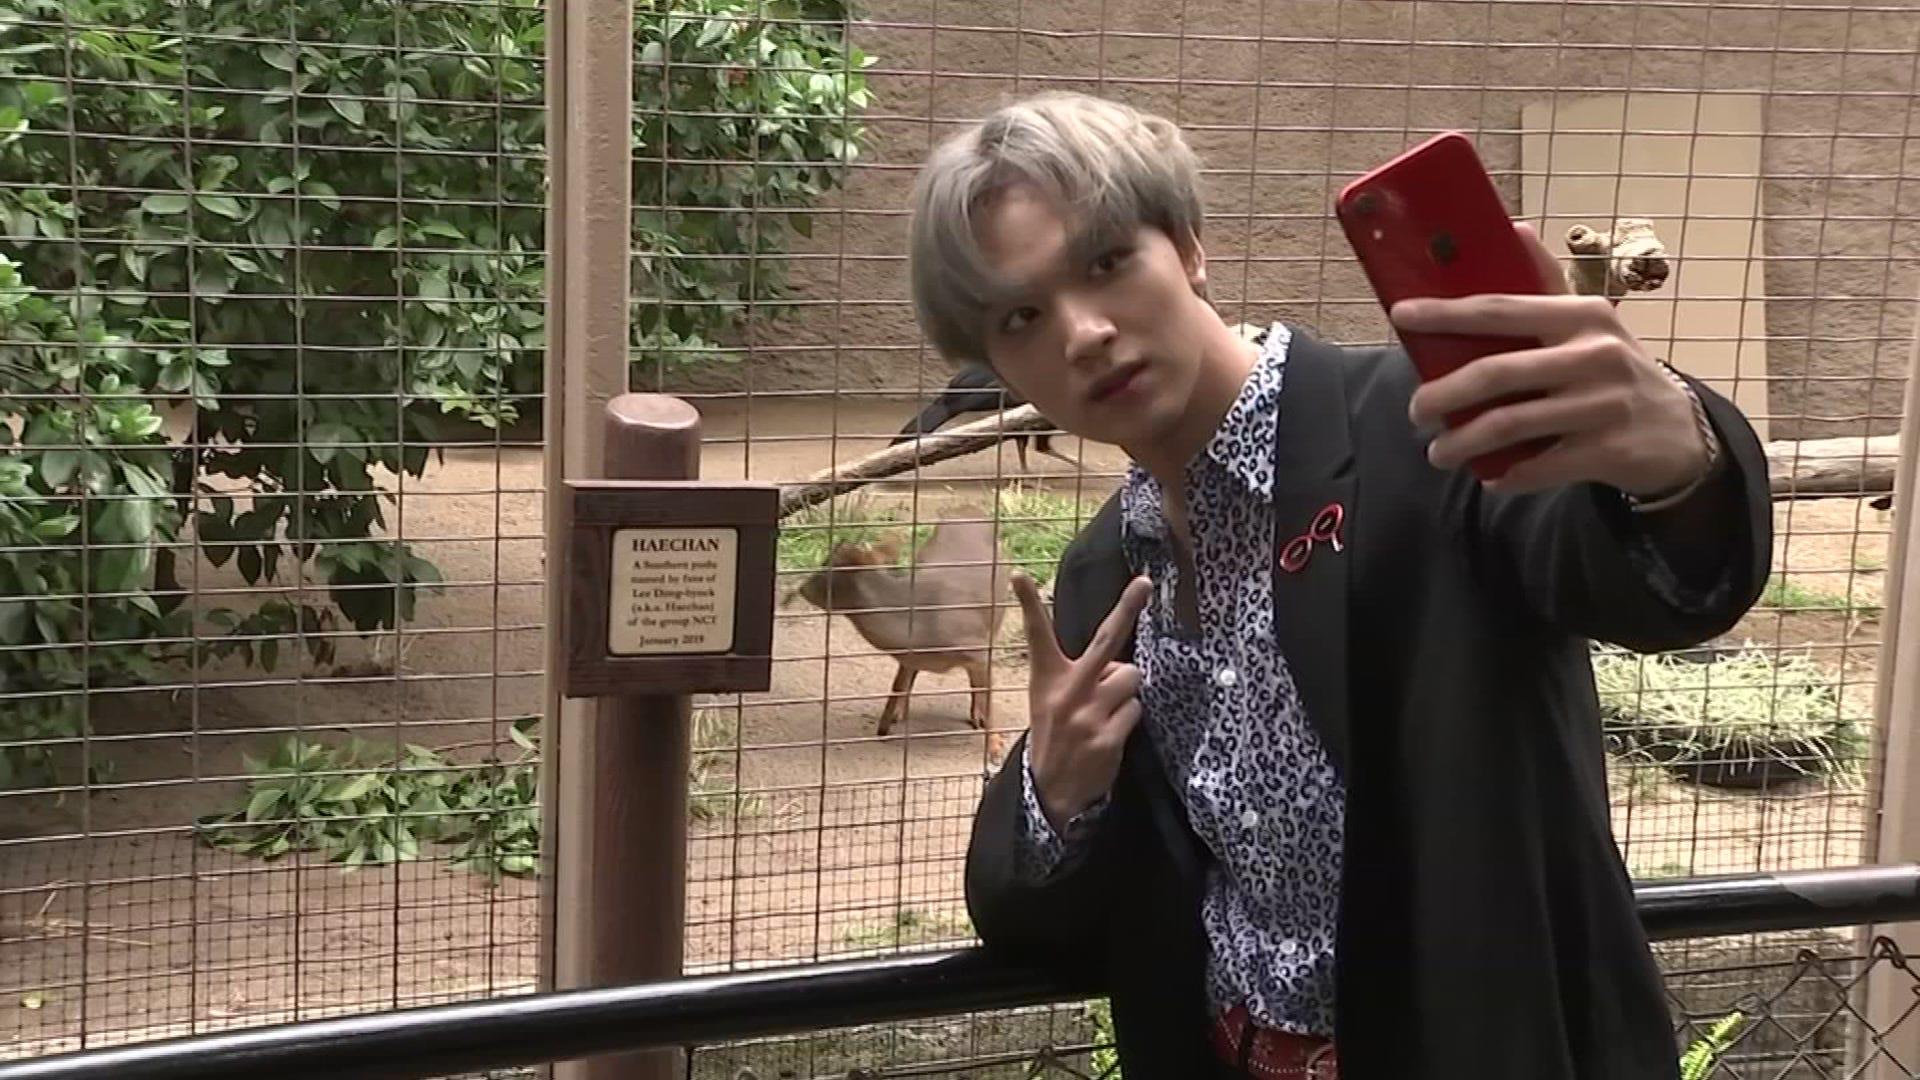 K-pop group NCT 127 visits the LA Zoo